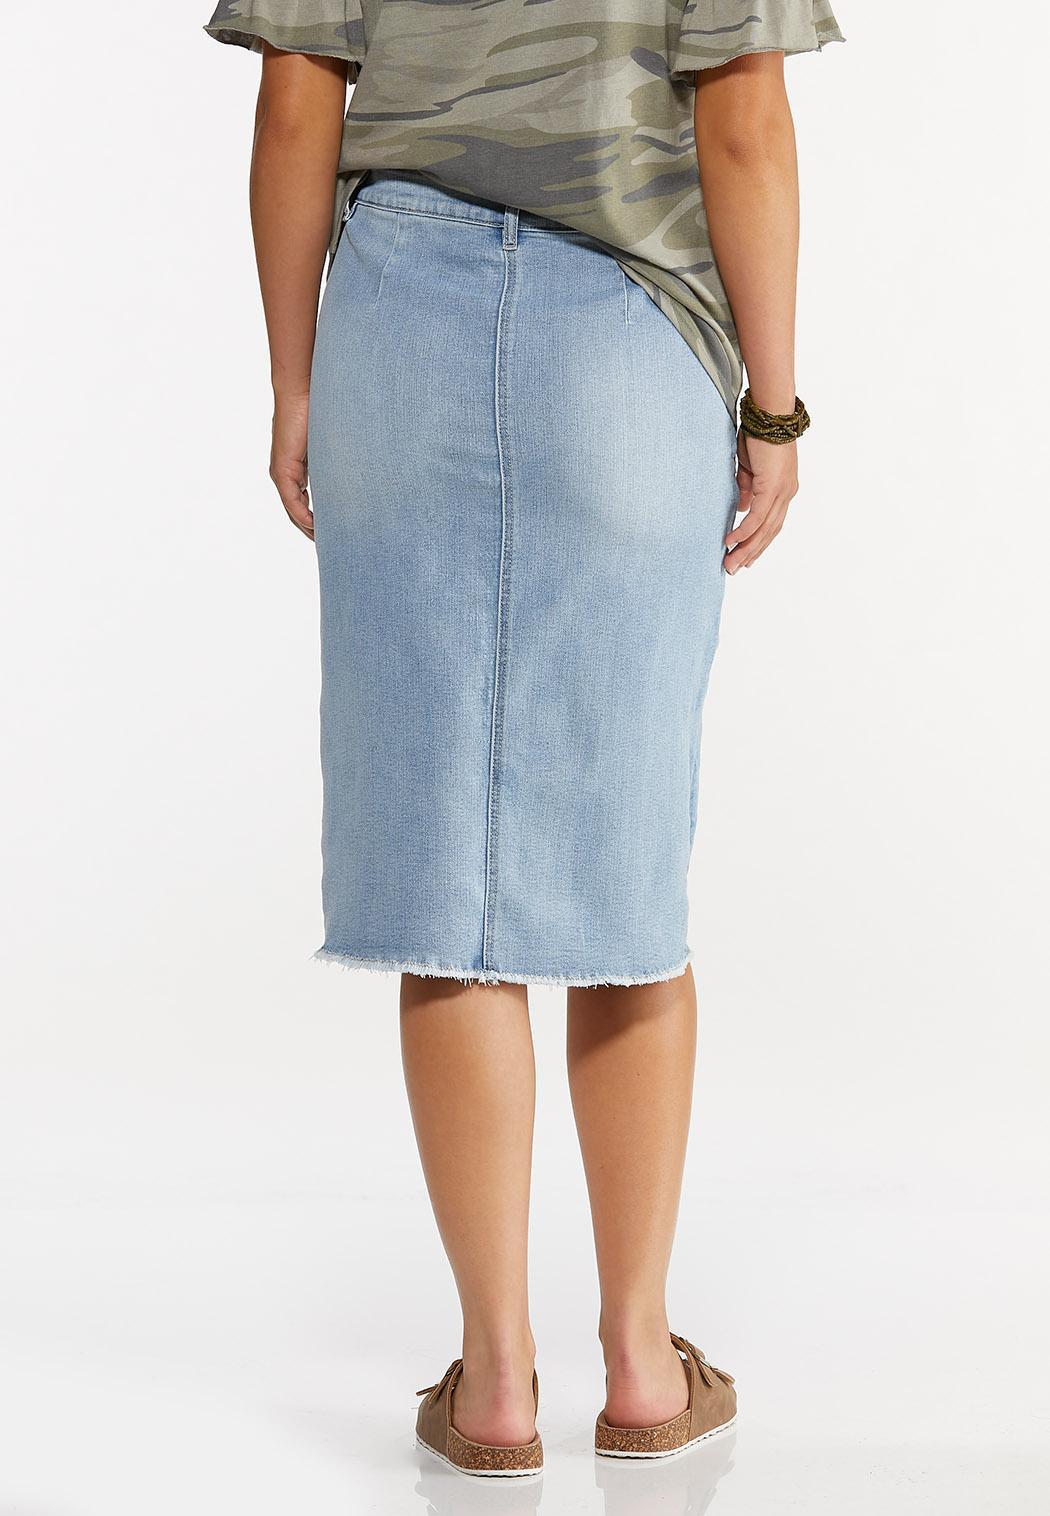 Plus Size Distressed Button Front Denim Skirt (Item #44627518)